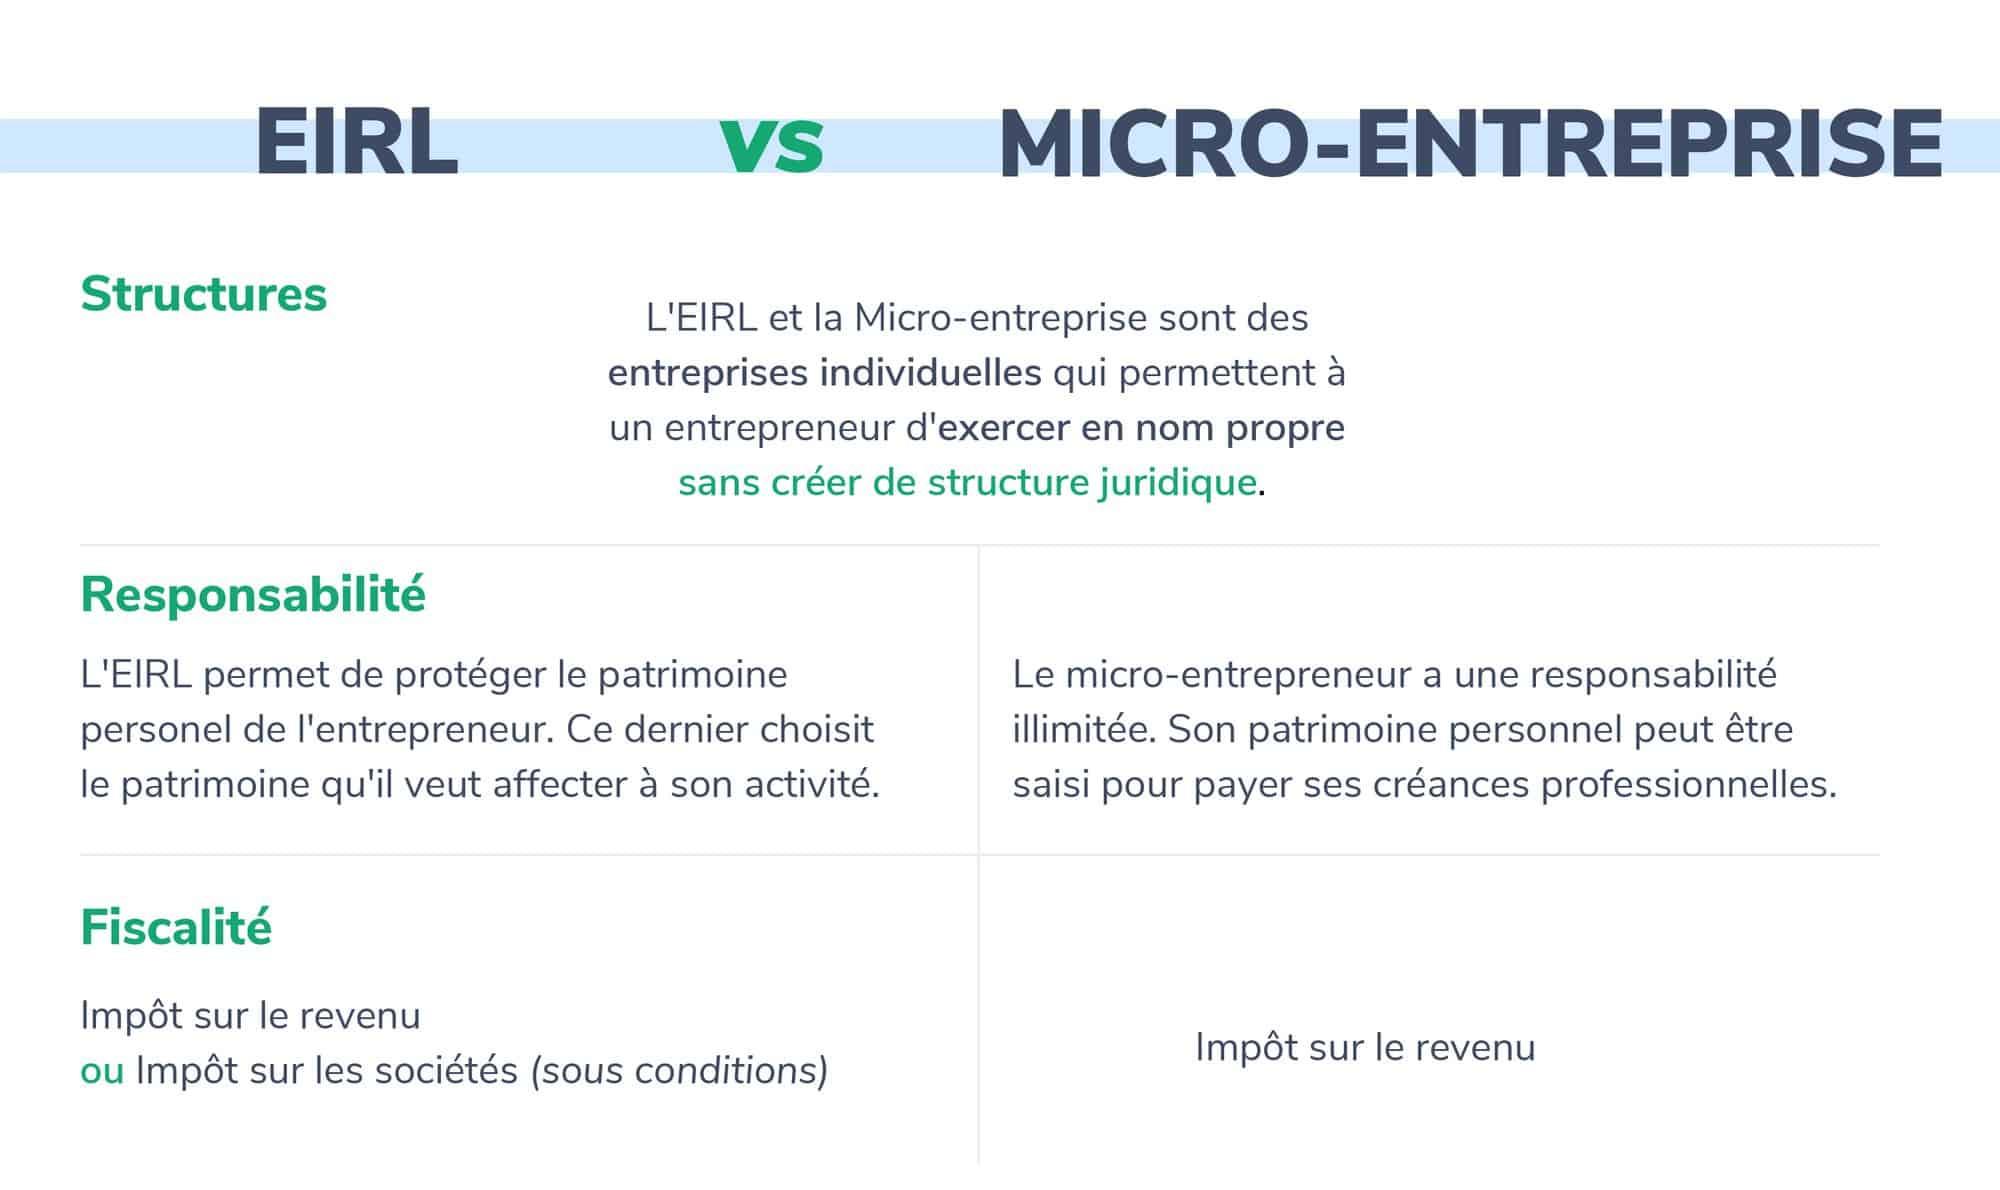 EIRL VS MICROENTREPRISE